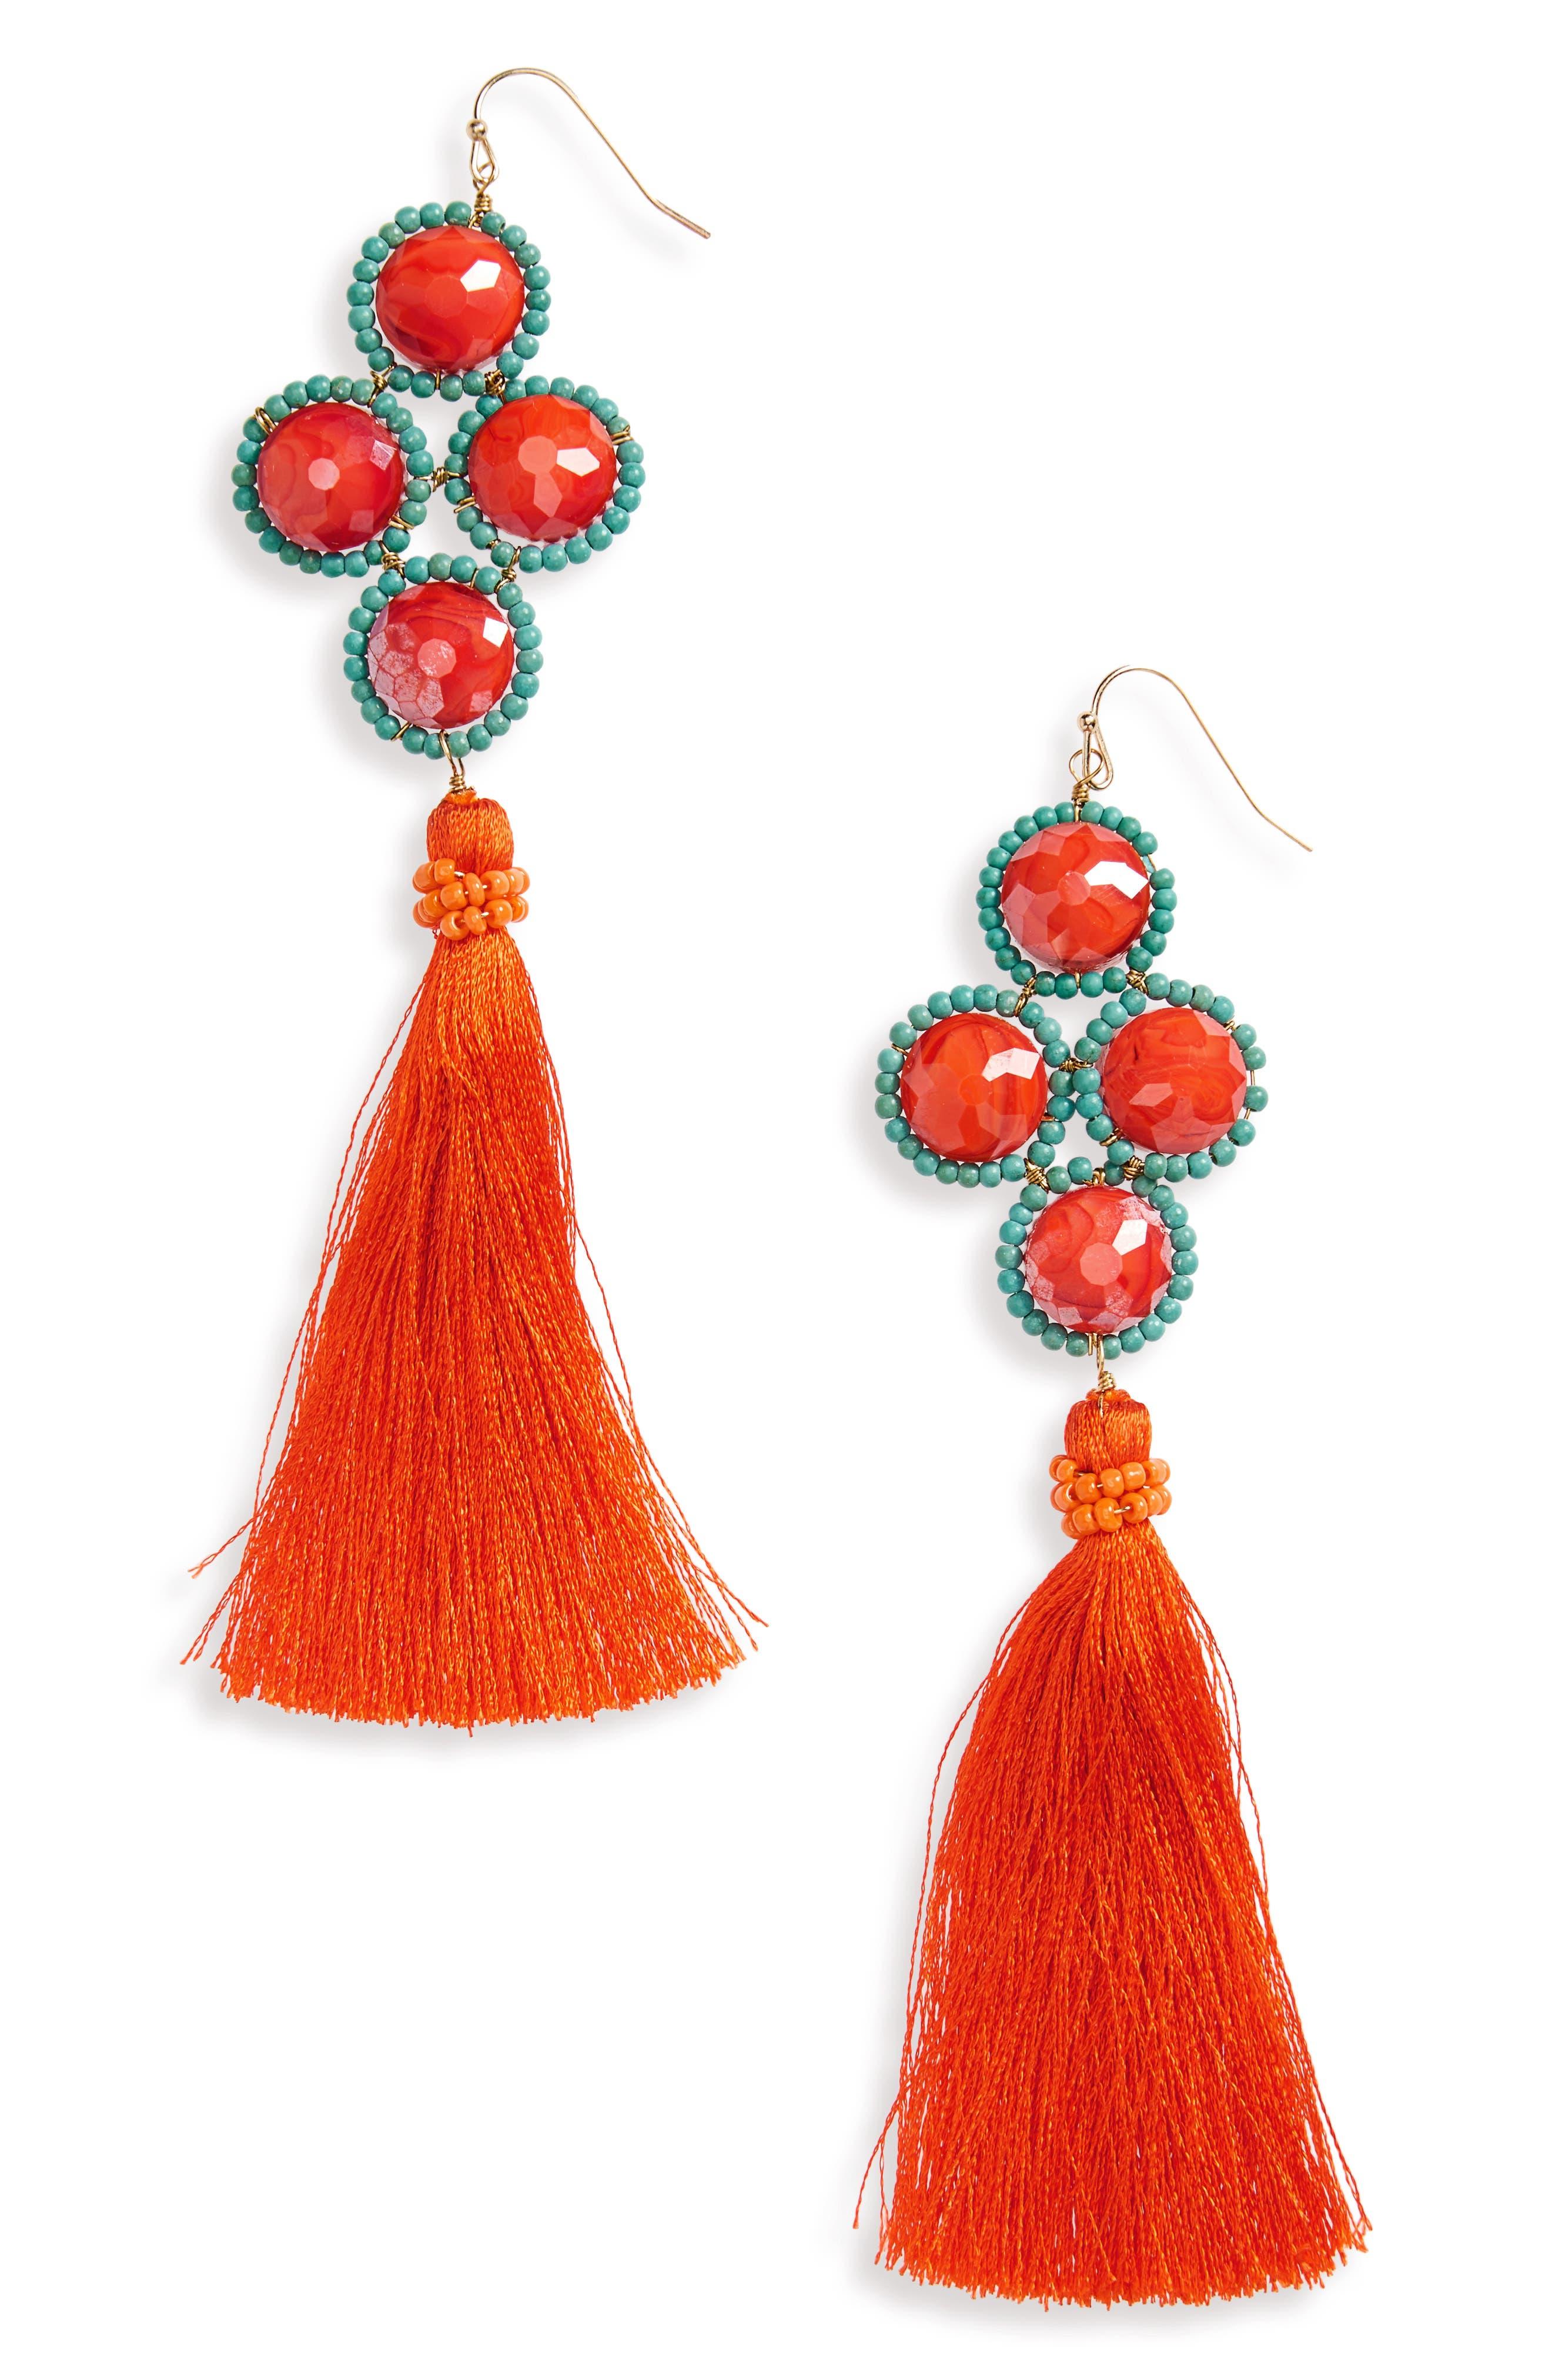 Howlite Stone Tassel Earrings,                             Main thumbnail 1, color,                             600